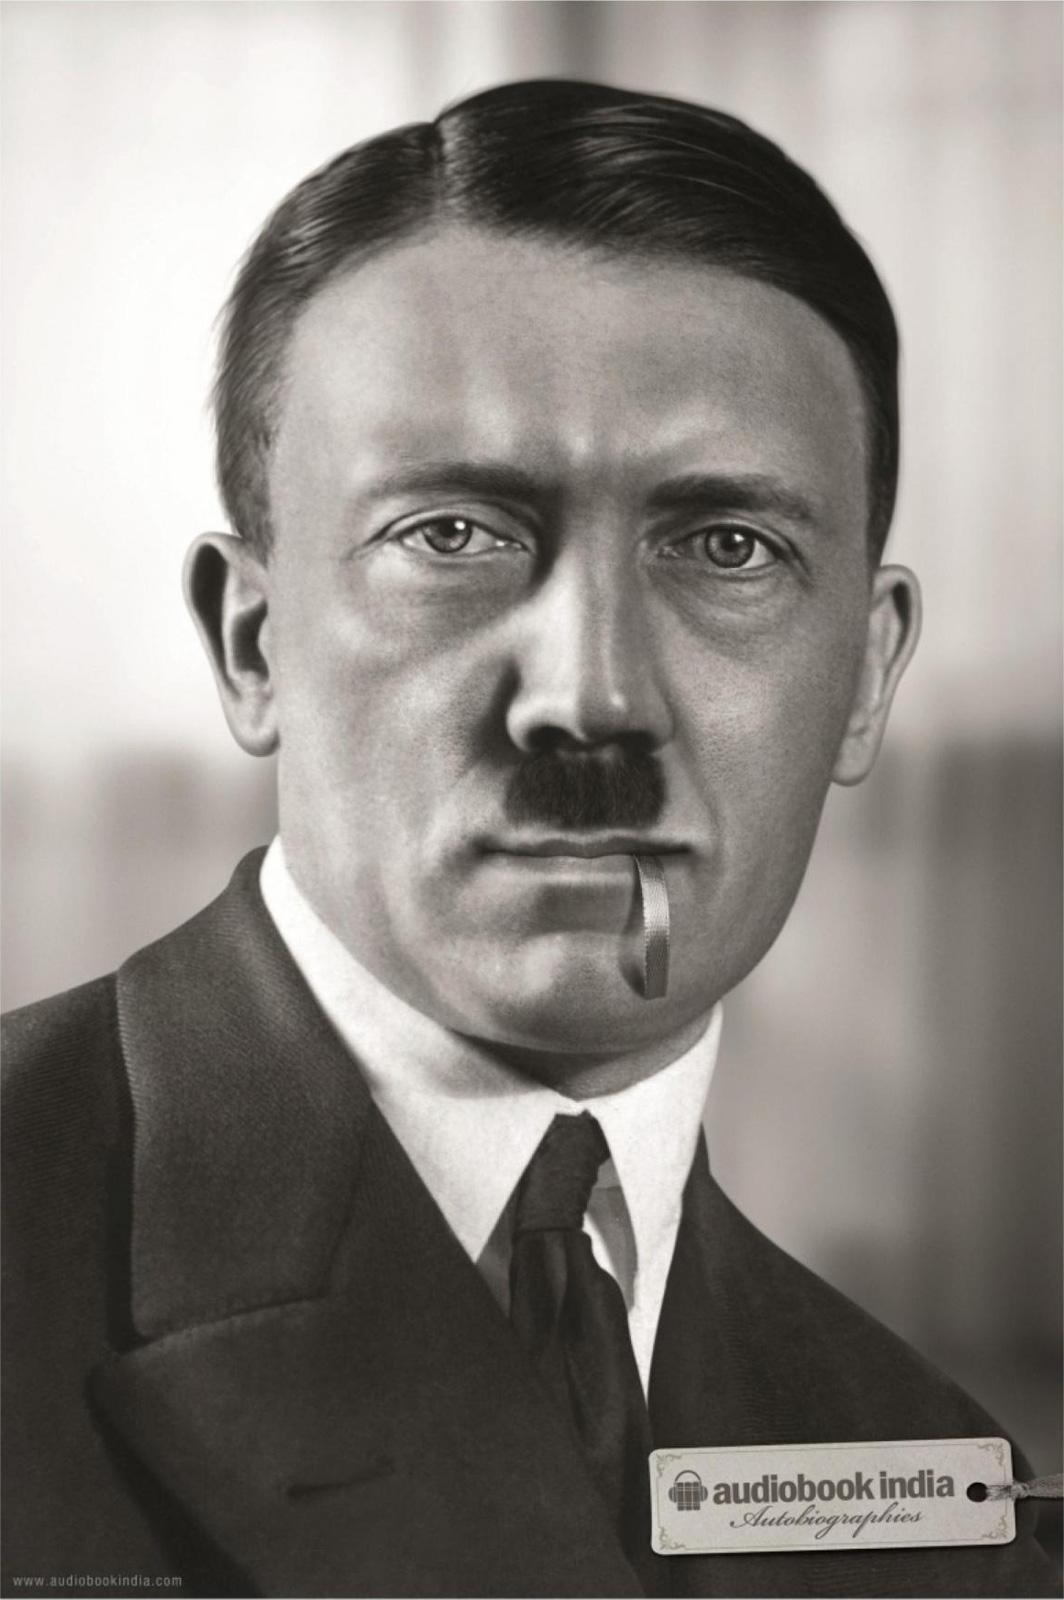 AudioBook India Print Ad -  Hitler